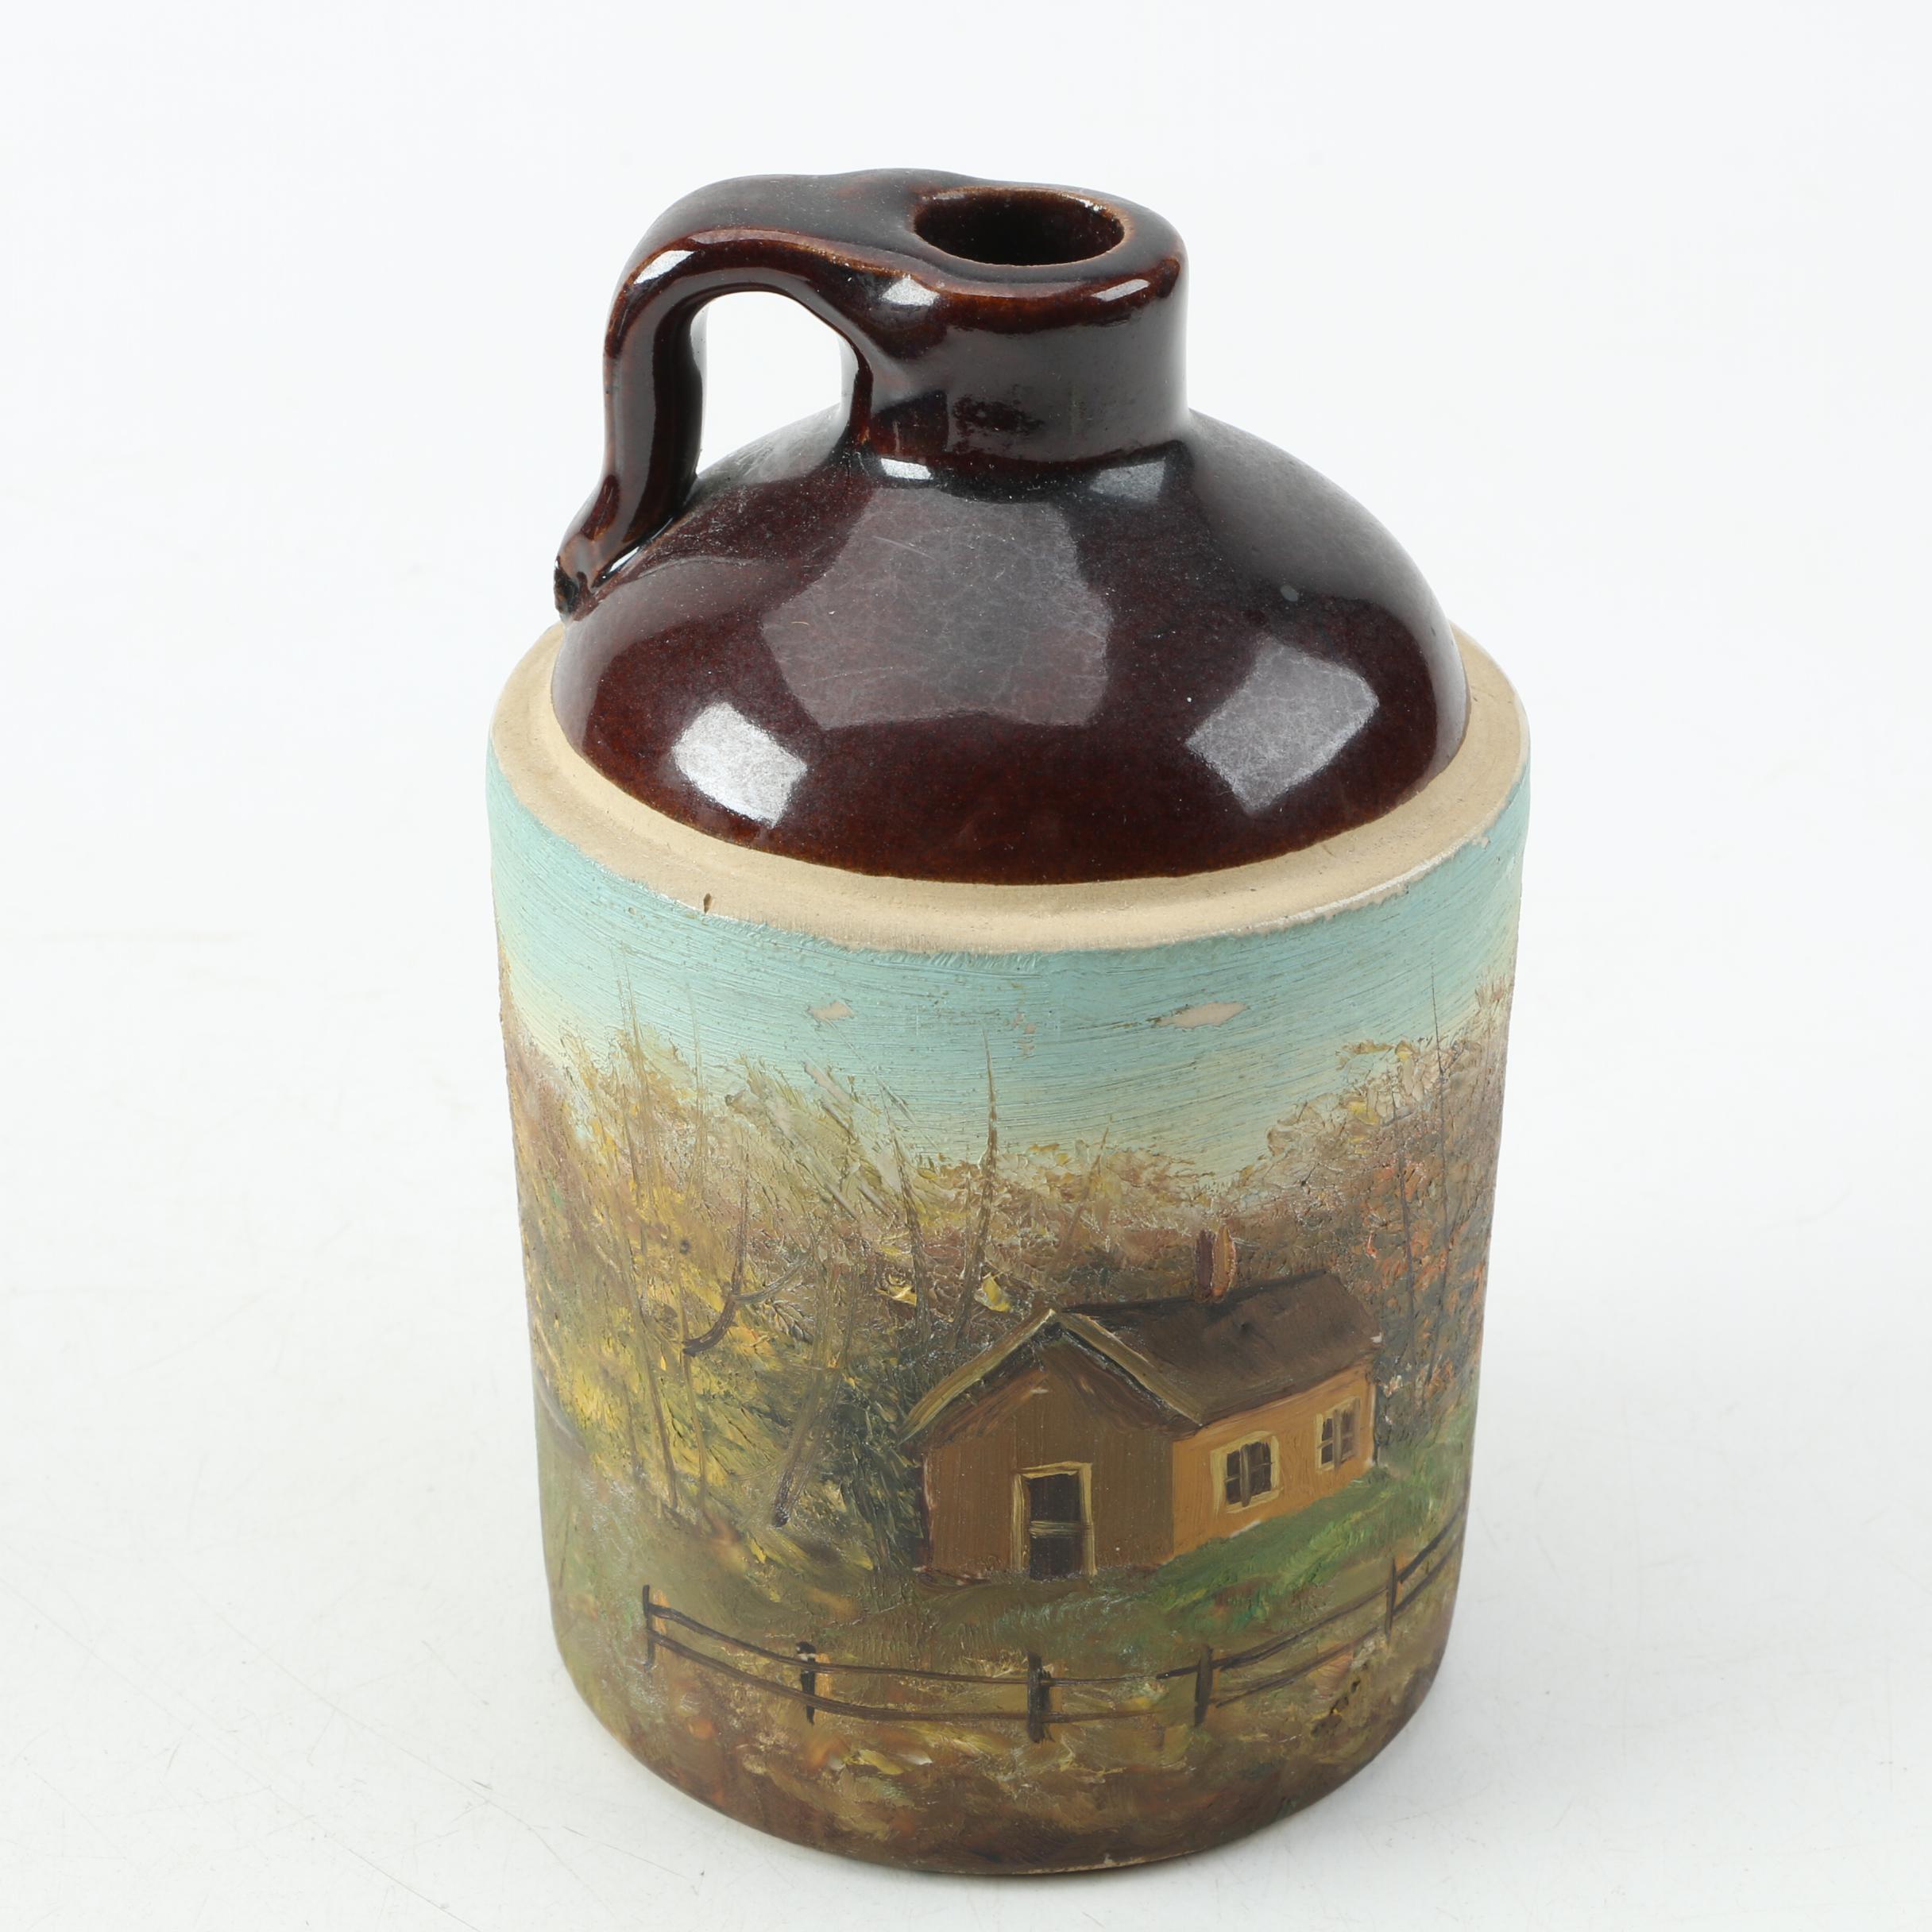 Painted Stoneware Jug